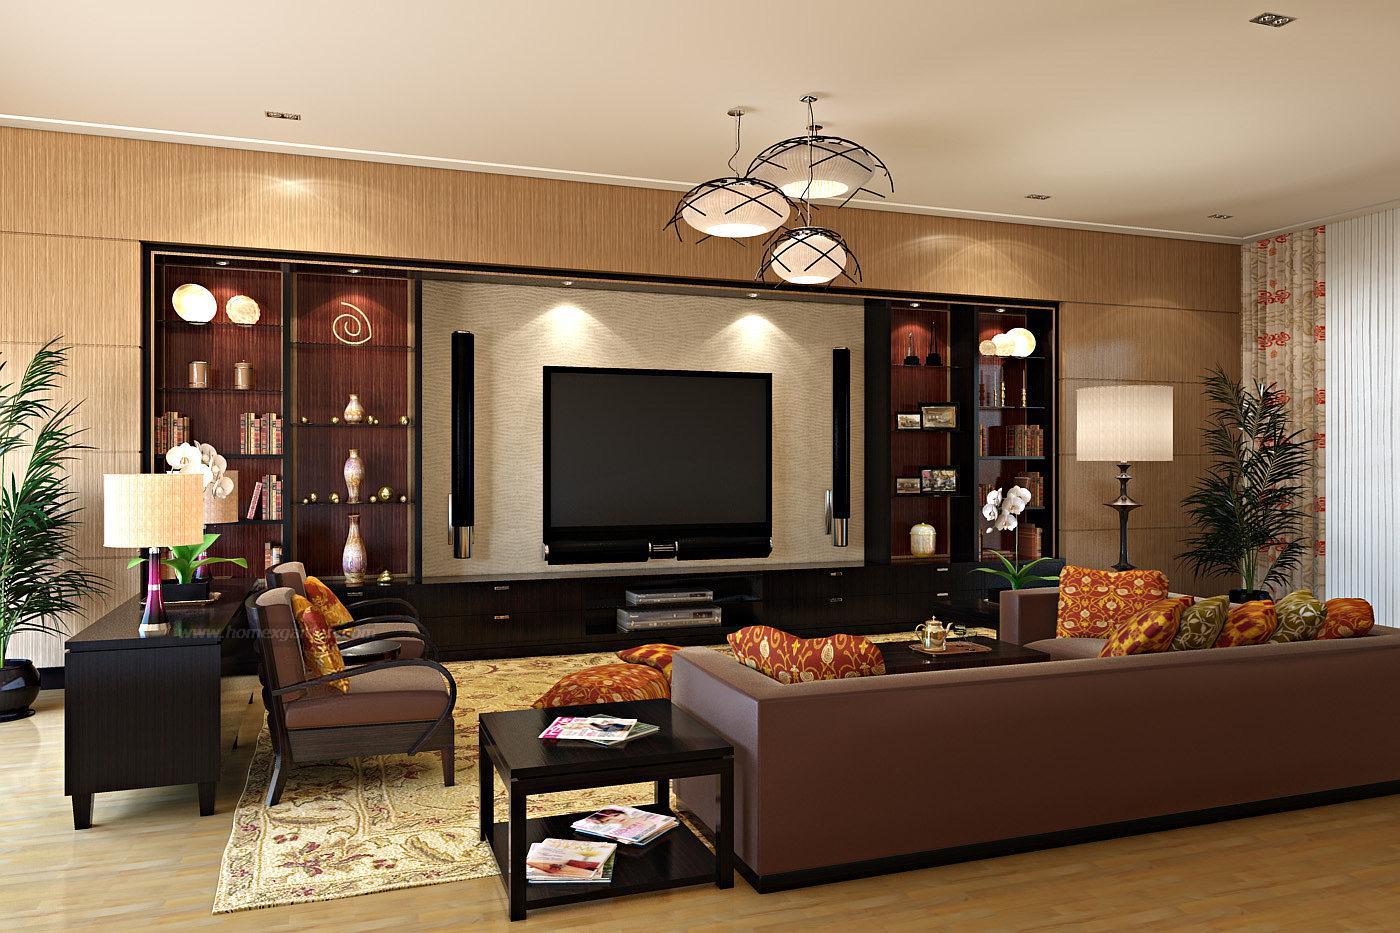 Cozy Home Decor Accessories Tildeoaklandcom 10 Simple Ways To Awaken And Interior home interior decorating ideas